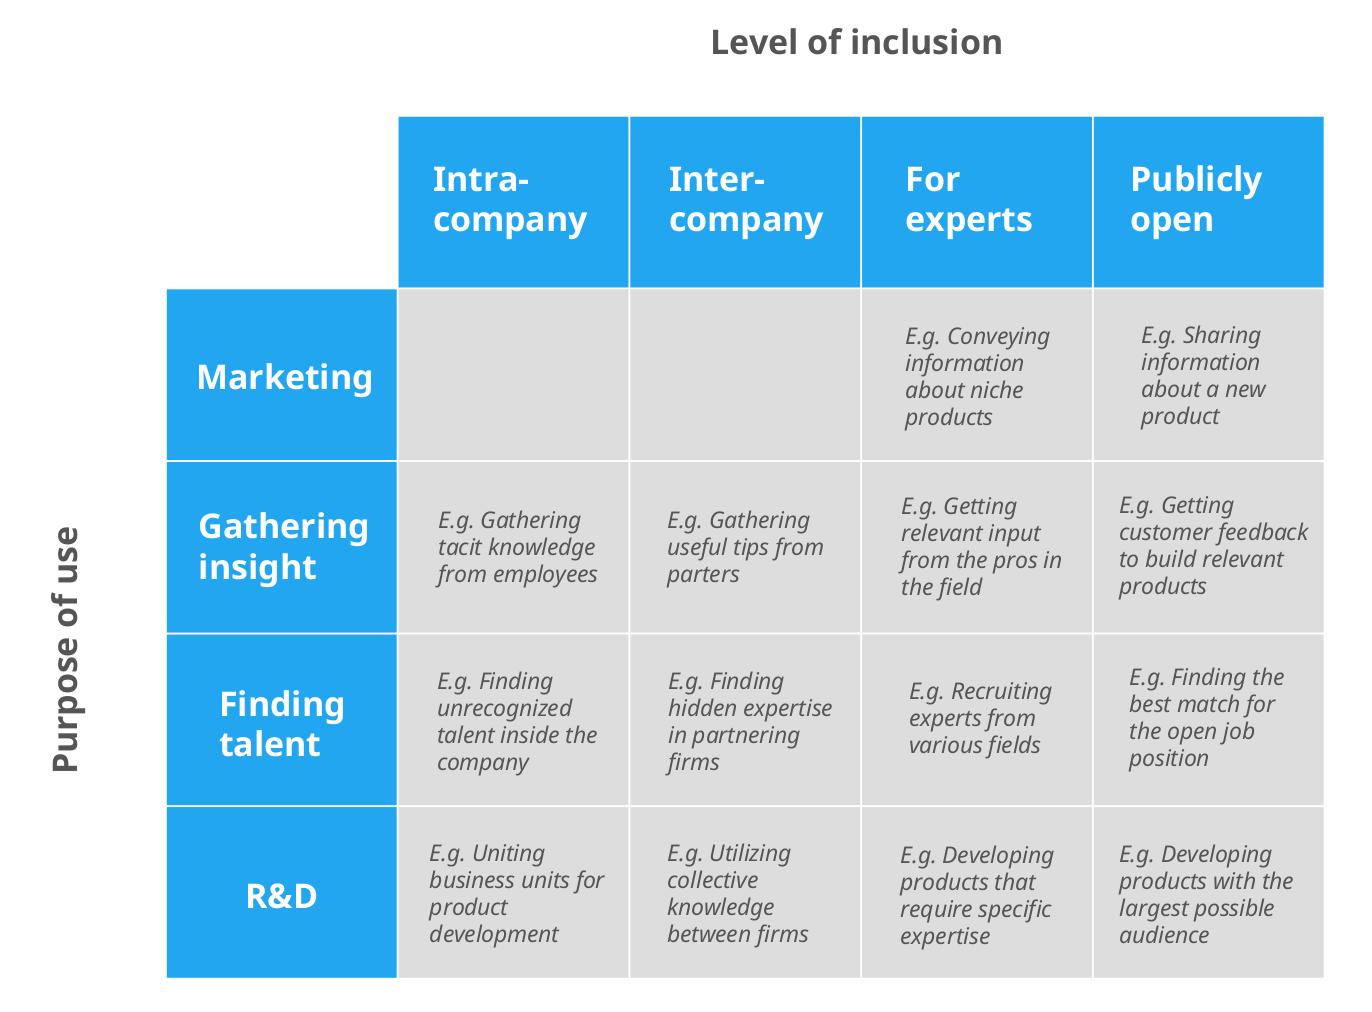 Types of open innovation